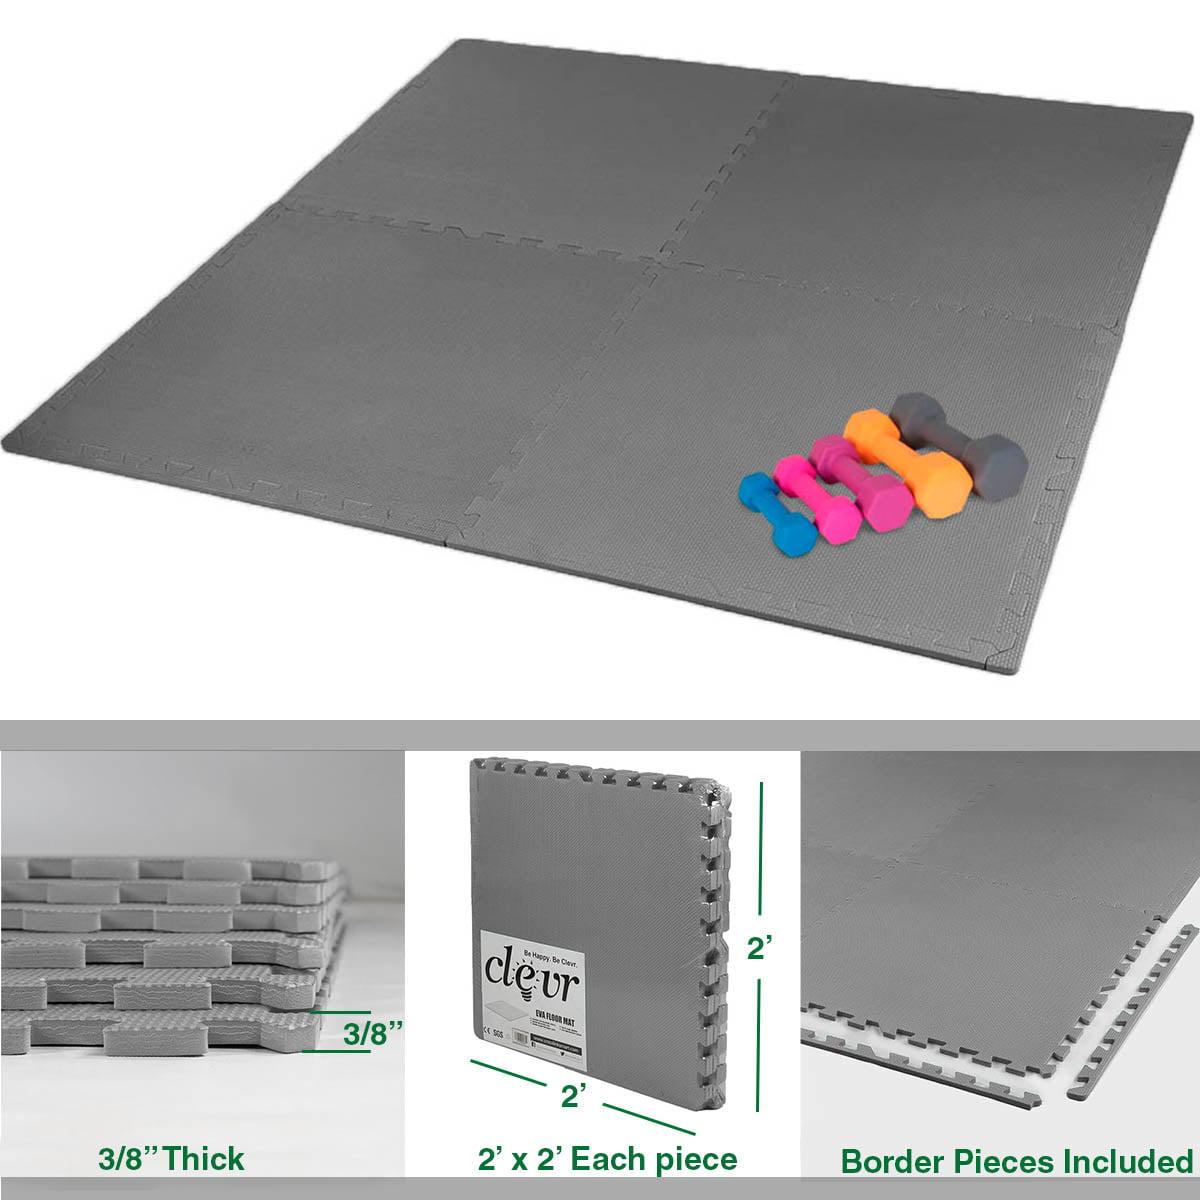 Clevr Interlocking Eva Gym Foam Floor Mat Tiles 24 Quot X 24